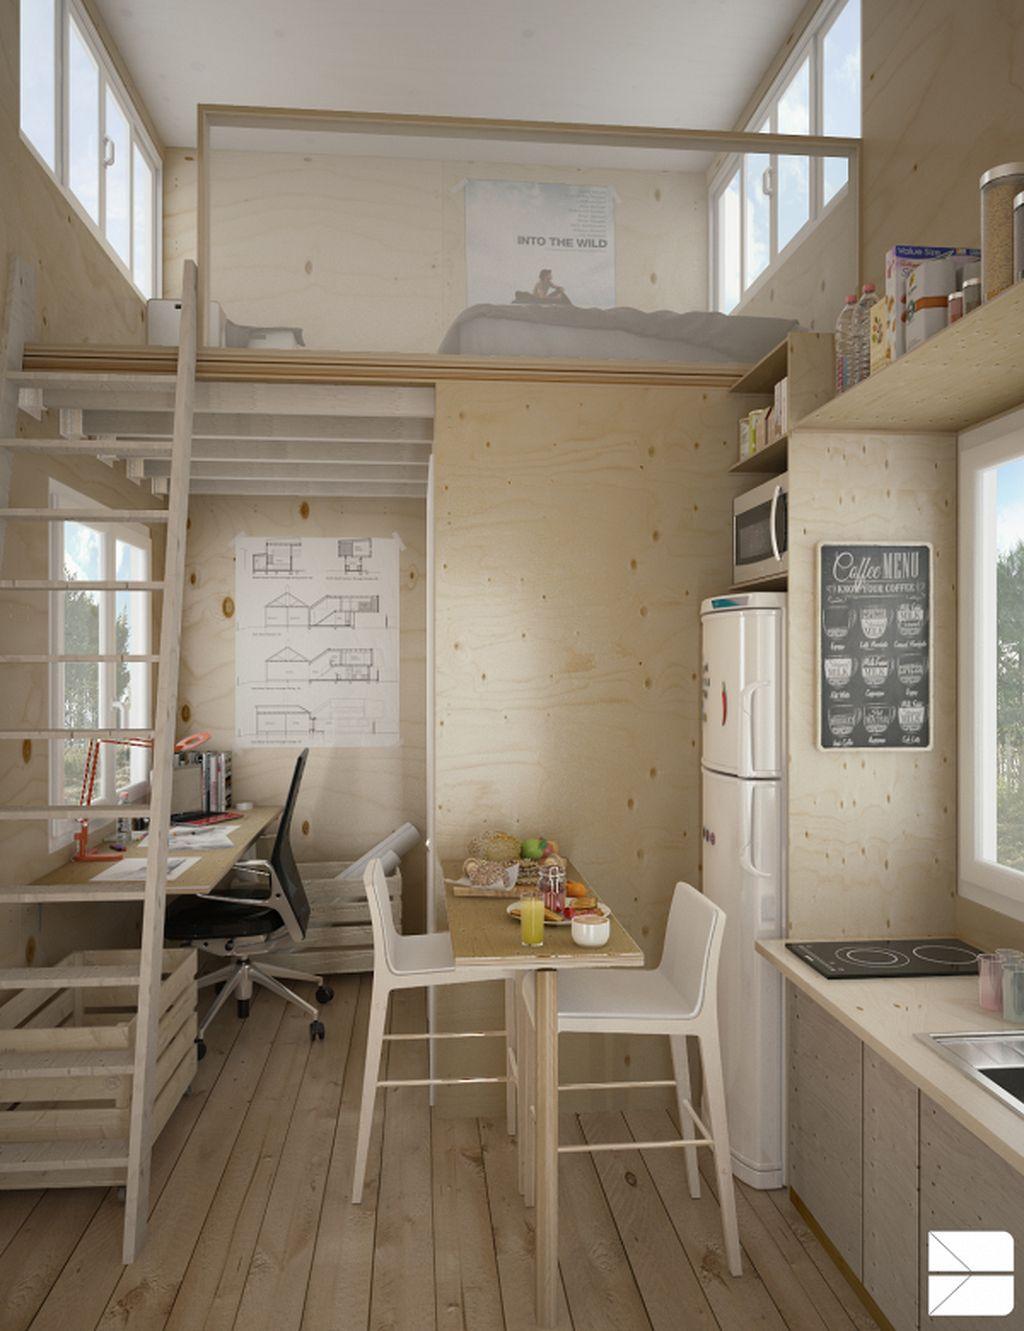 Stunning 40 Clever Micro Apartment Organization Ideas Https Kidmagz Com 40 Clever Micro A Small House Interior Design Small House Interior Tiny House Design